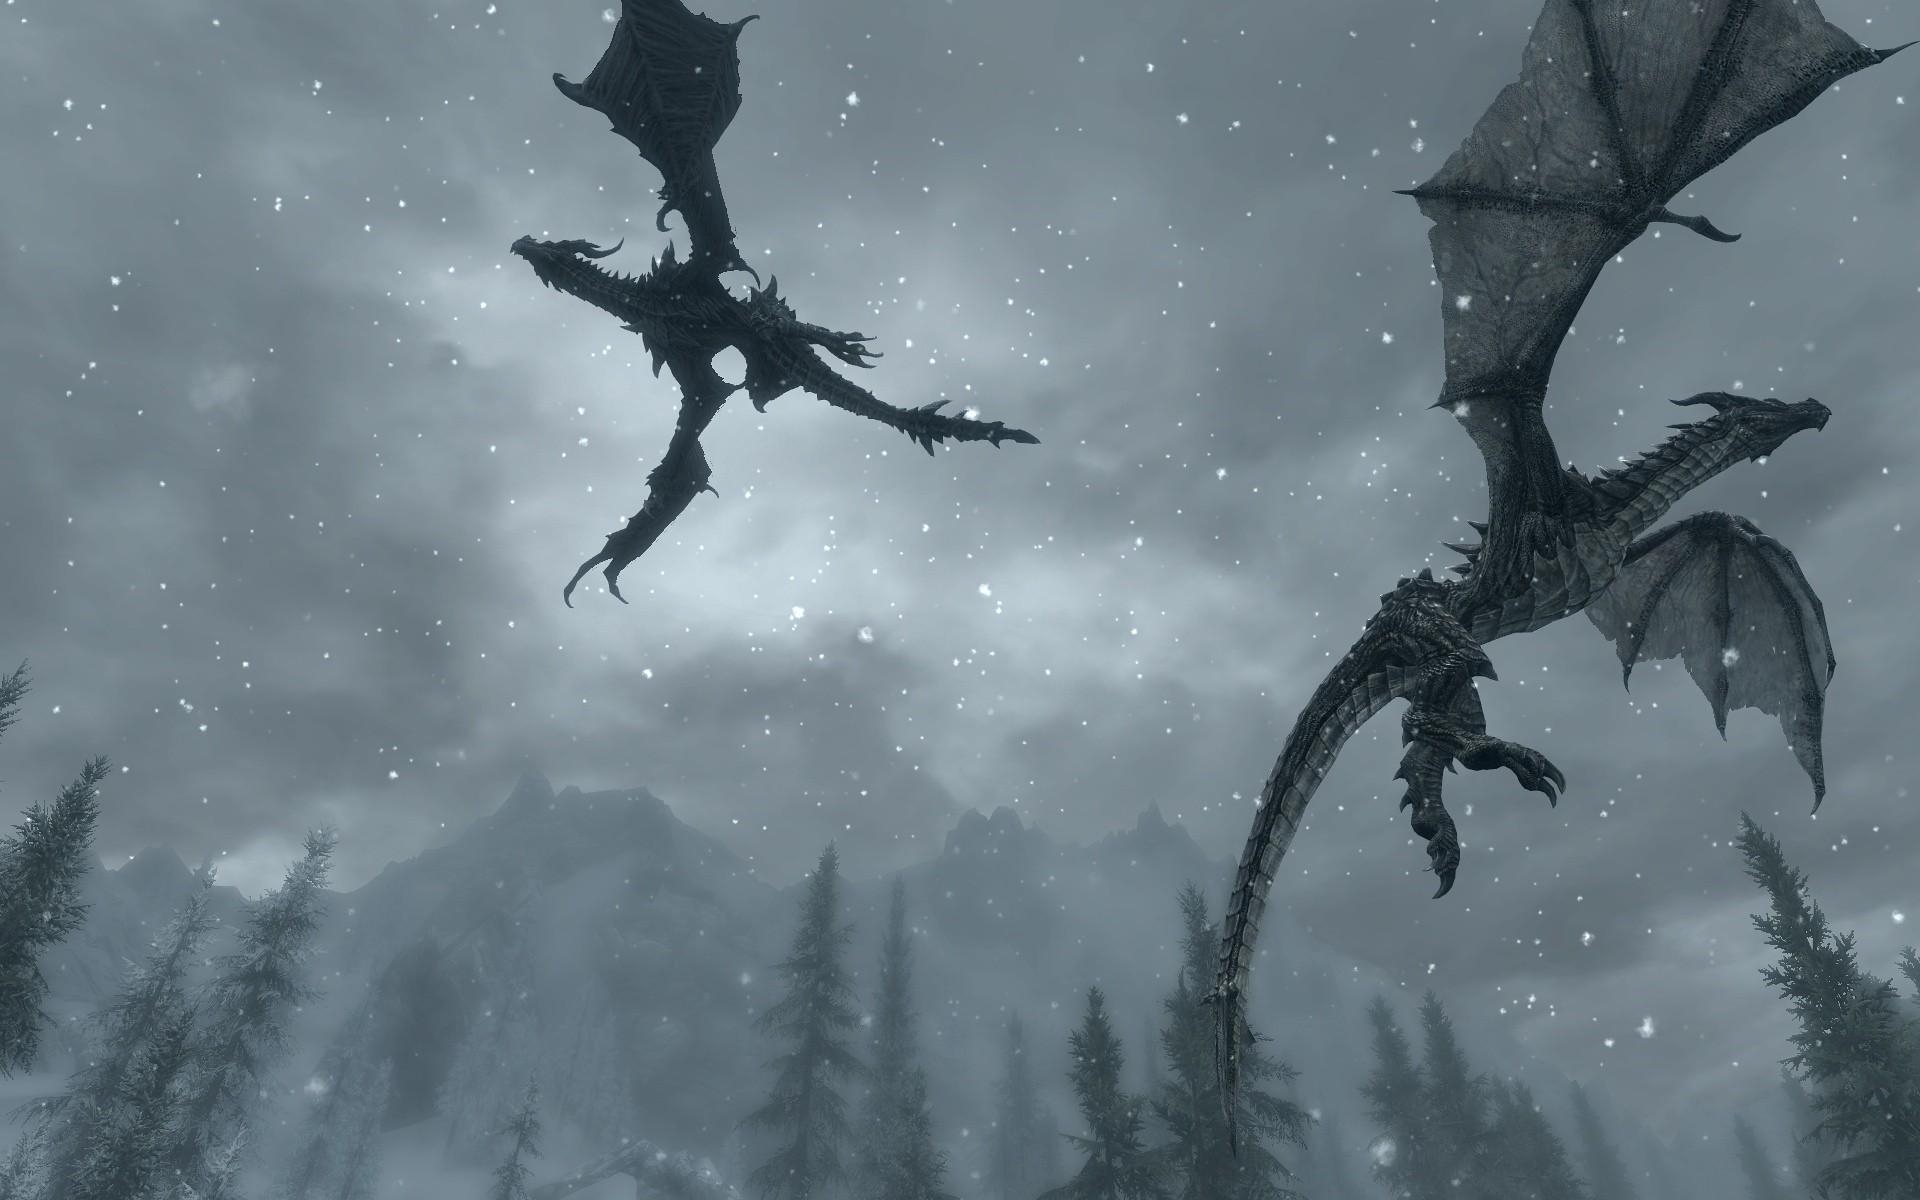 14543698436_b8ca19c347_k.jpg - The Elder Scrolls 5: Skyrim